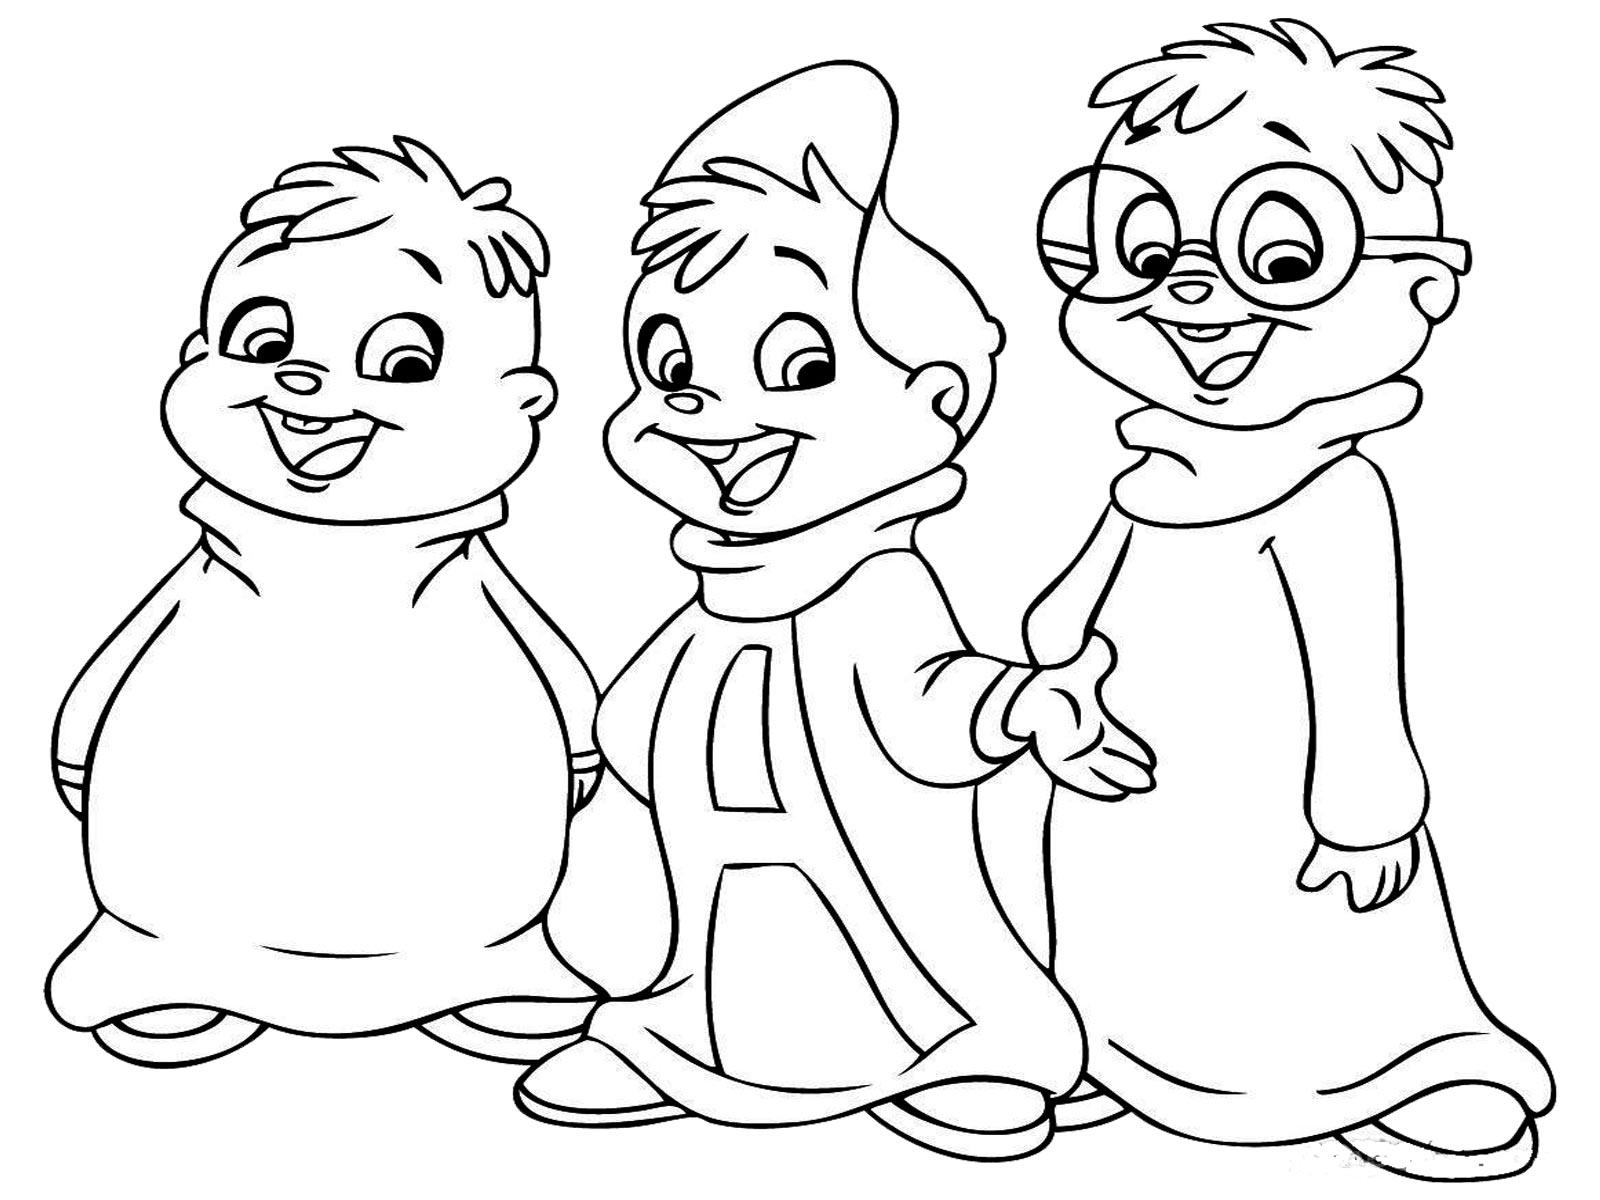 1600x1200 Pleasant Cartoon Coloring Pages Shopkins